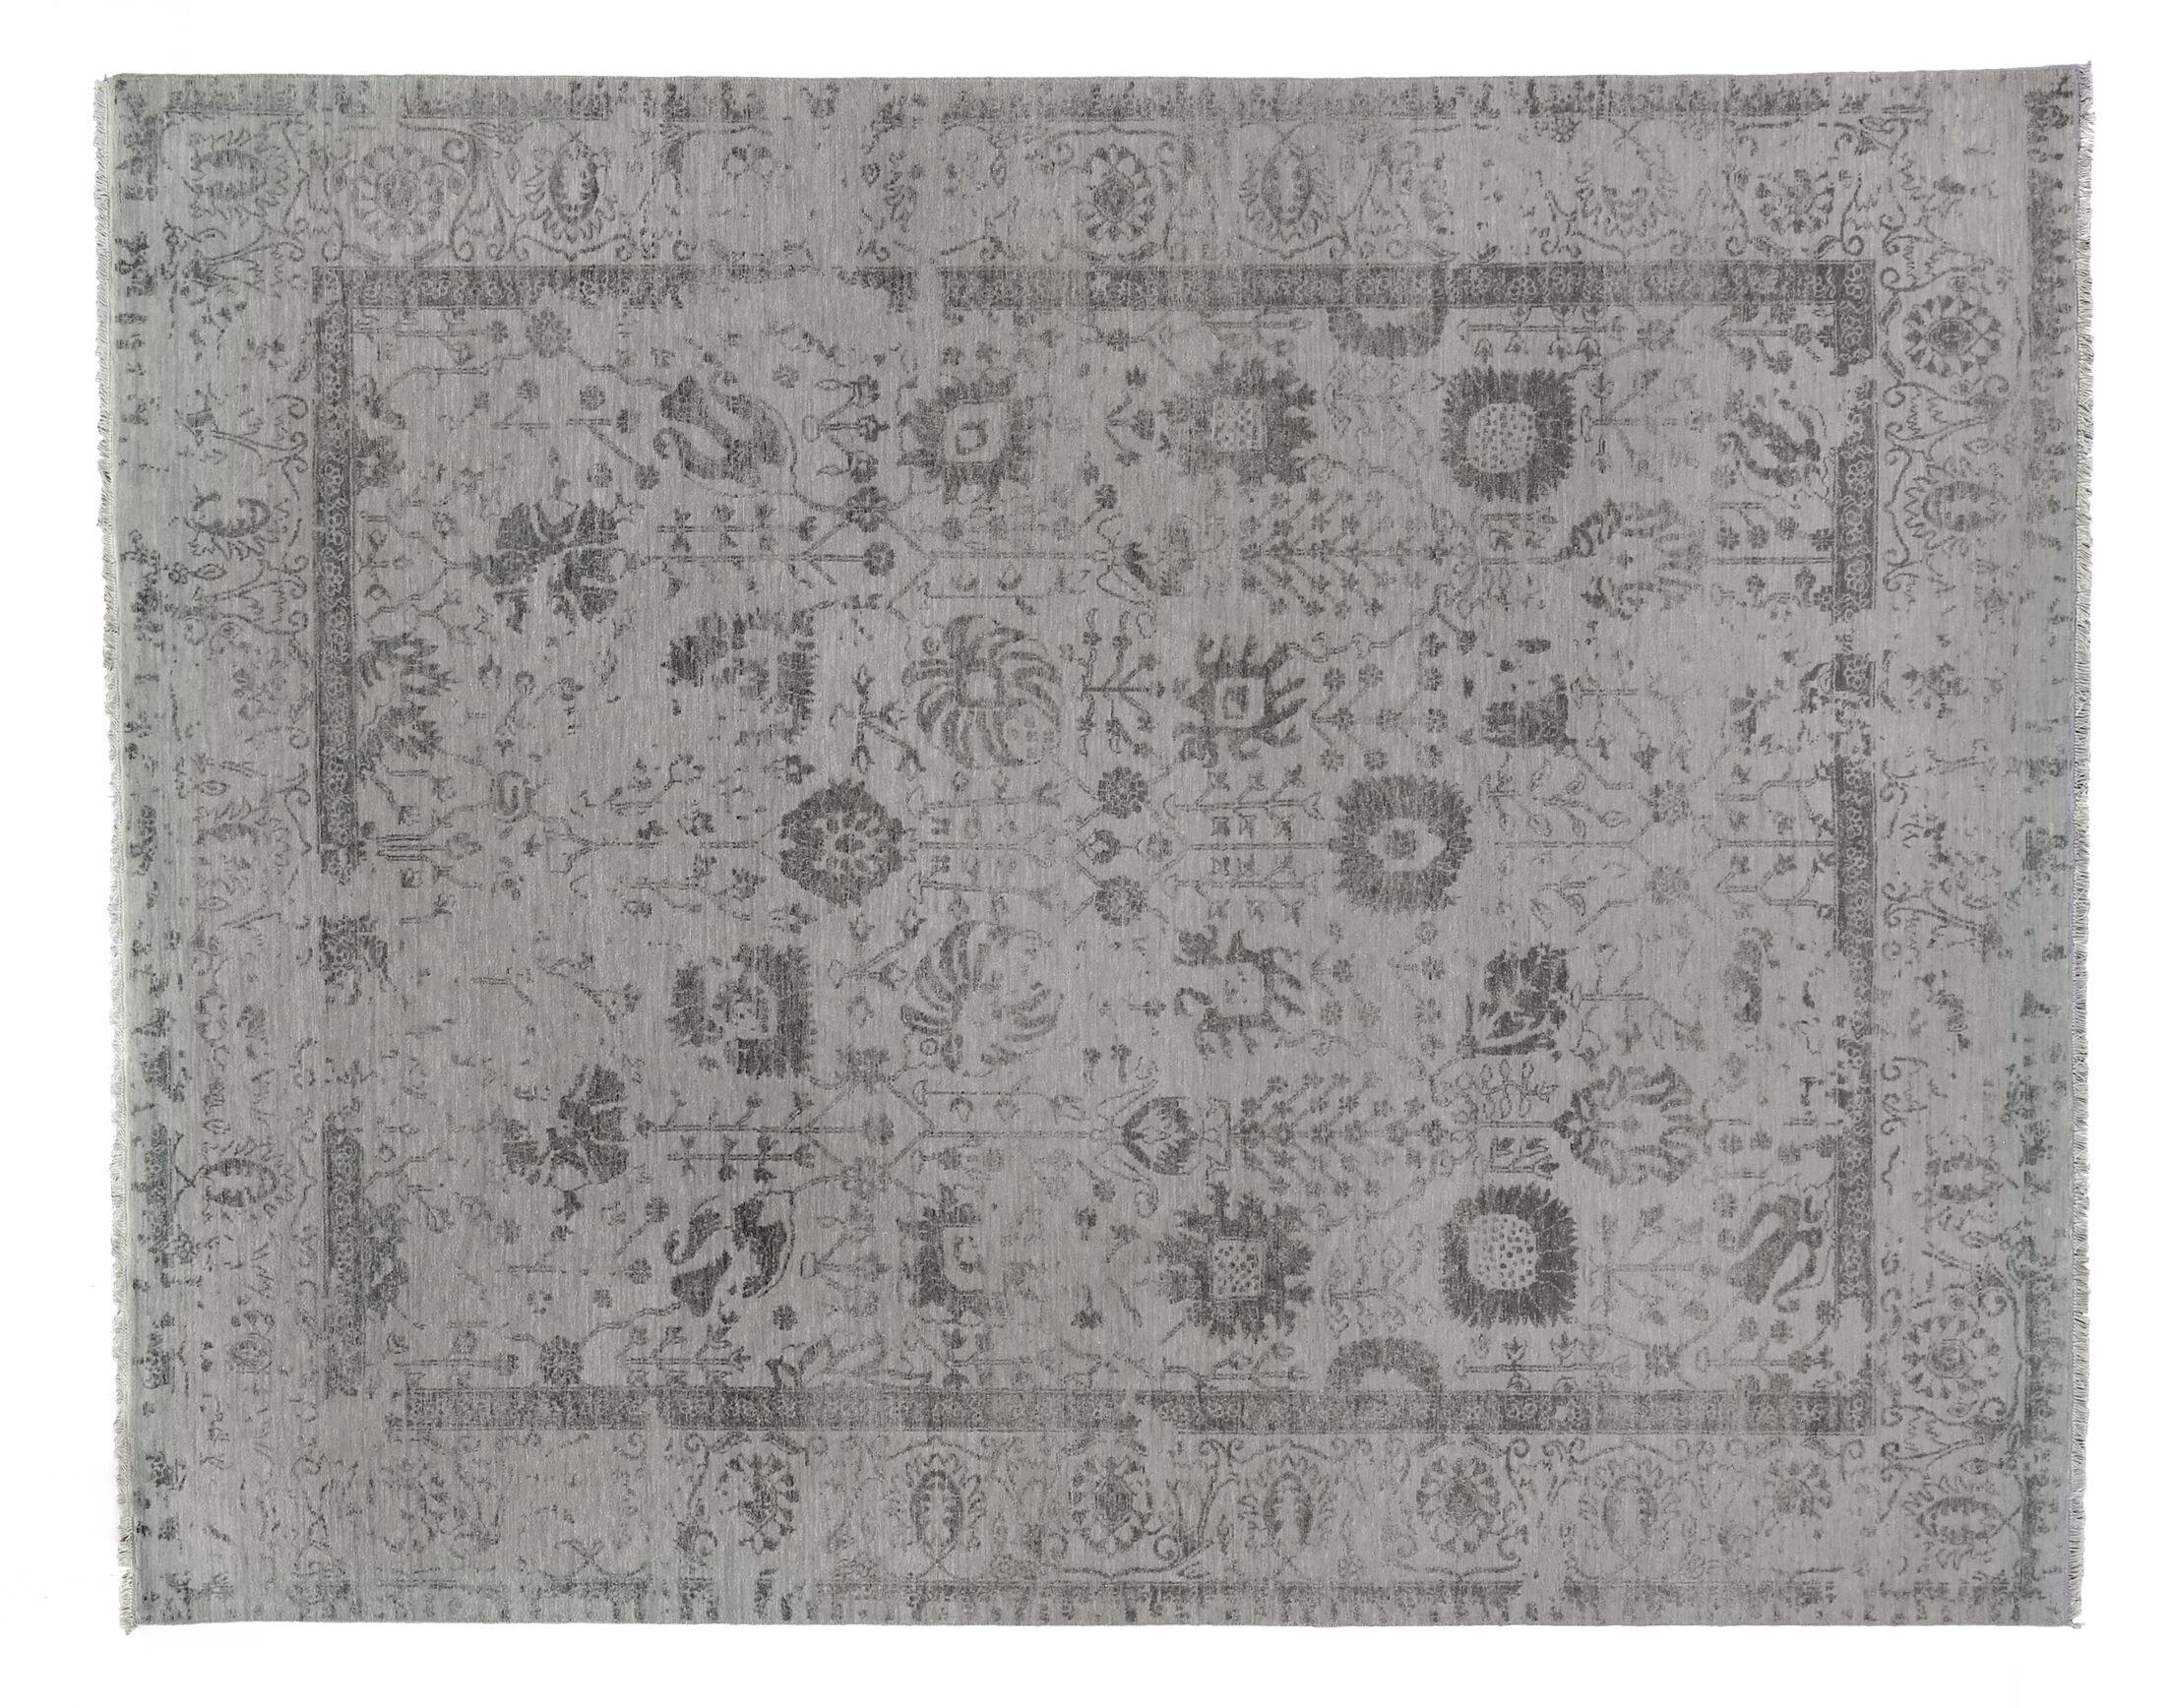 Lexington Hand-Knotted Silver/Aqua Area Rug Rug Size: Rectangle 9' x 12'